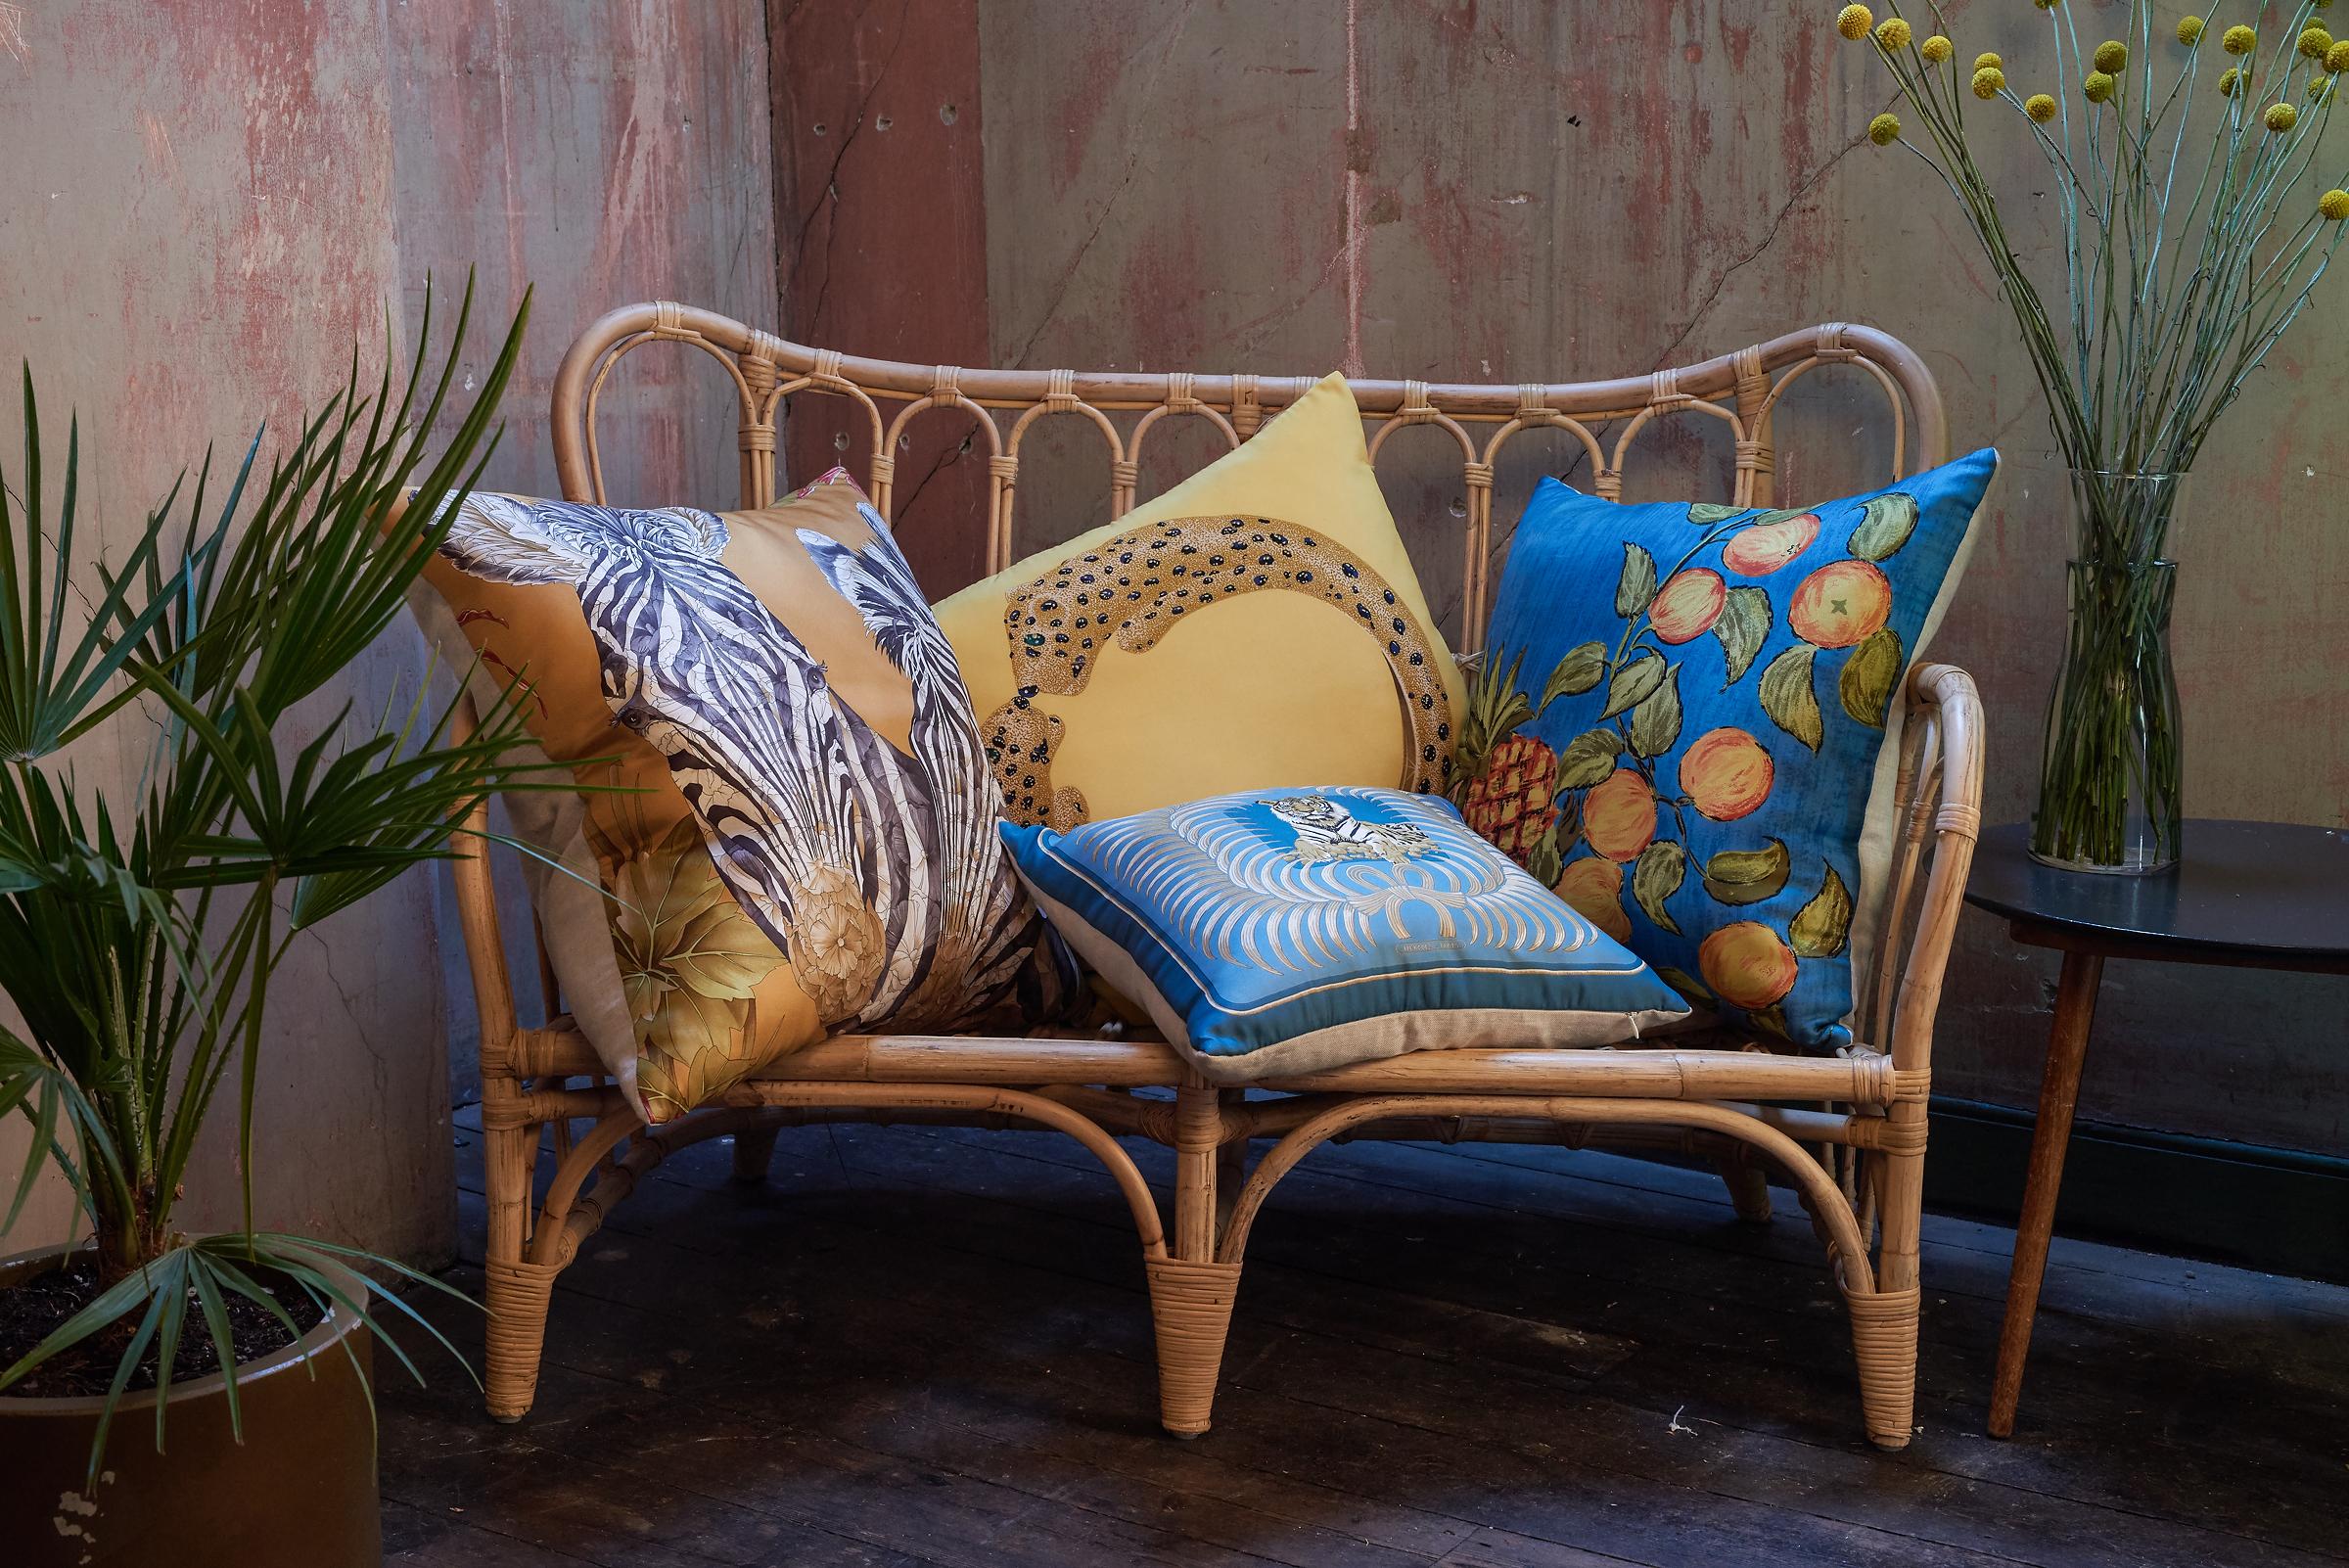 Belfast designer Katie Larmour's Luxury Handcrafted Vintage Silk Scarf and Irish Linen Cushions Pillows, 2014, Brown Thomas Dublin Ireland 3 .JPG